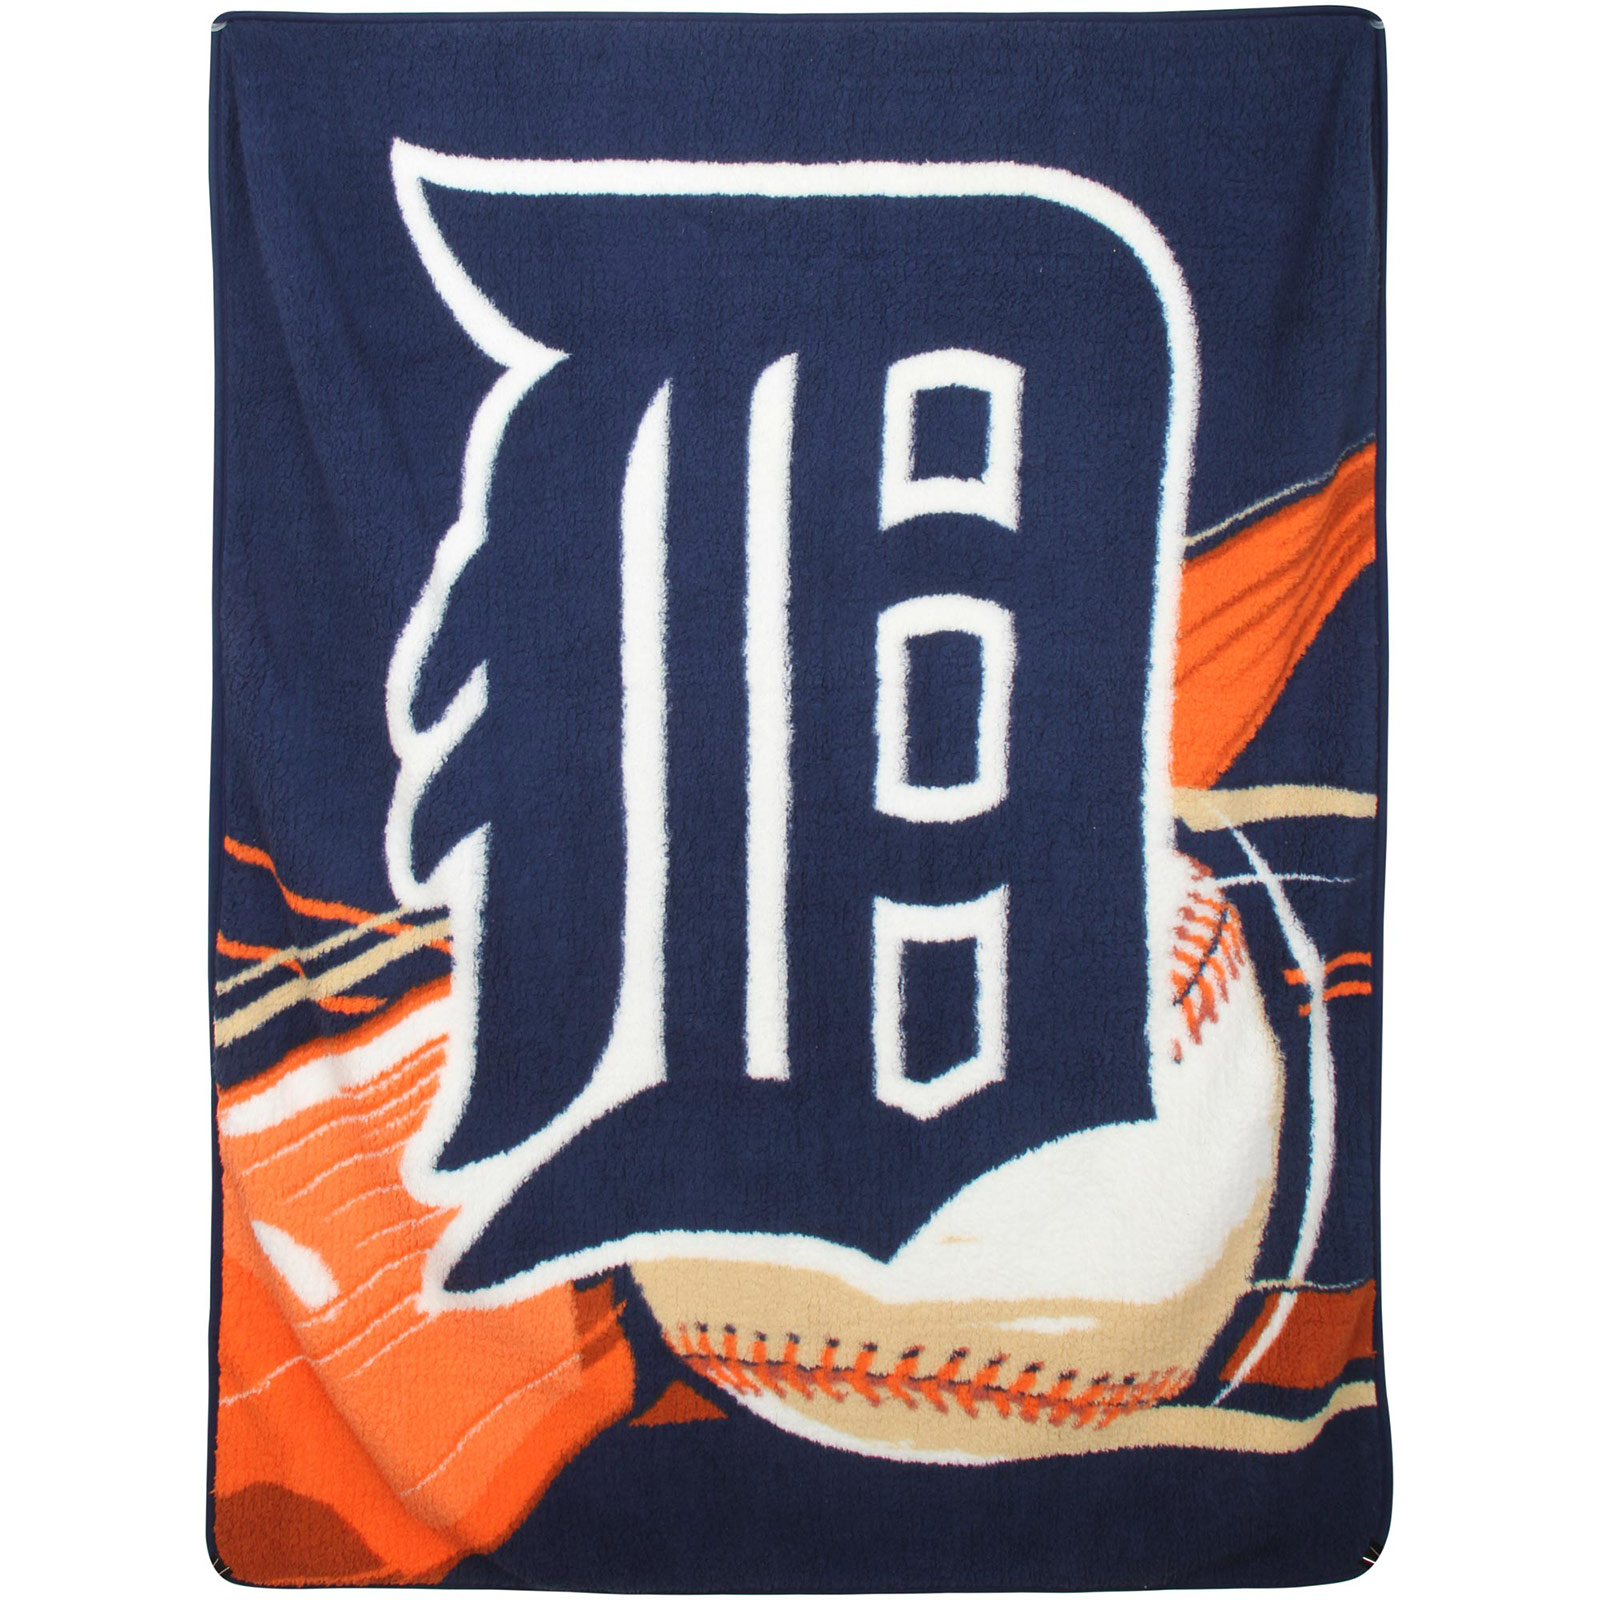 "Detroit Tigers 50"" x 60"" Big Stick Sherpa Throw Blanket - Navy Blue/Orange - No Size"